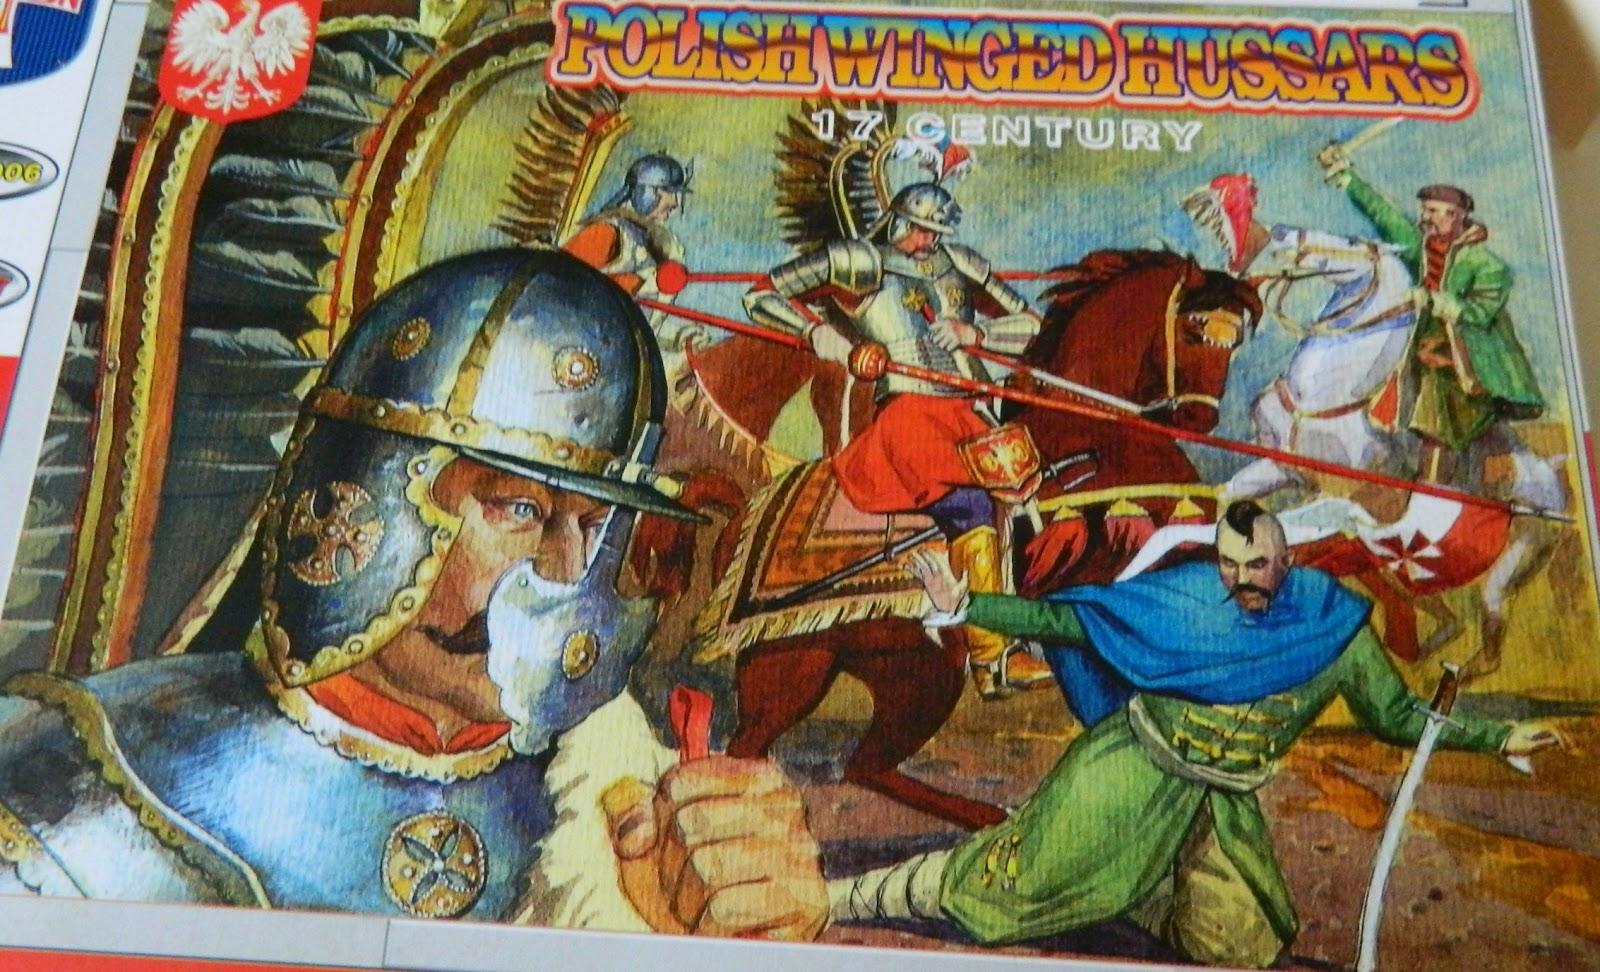 http://warhammster.blogspot.com/2014/08/polish-winged-hussars-xvii-century_6.html